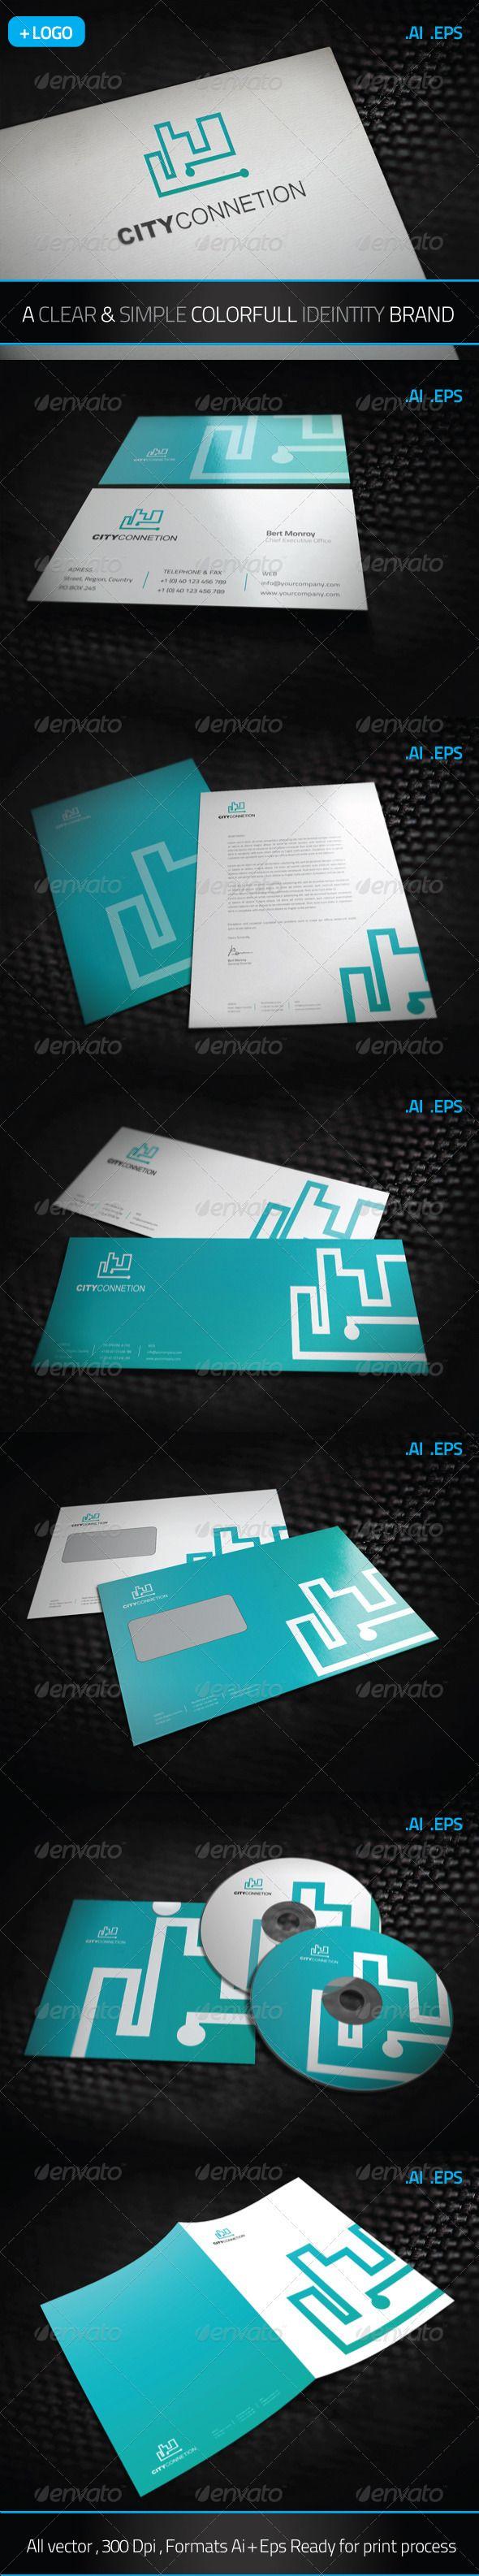 Cassandra cappello graphic design toronto - Corporate Identity Branding Graphic Design